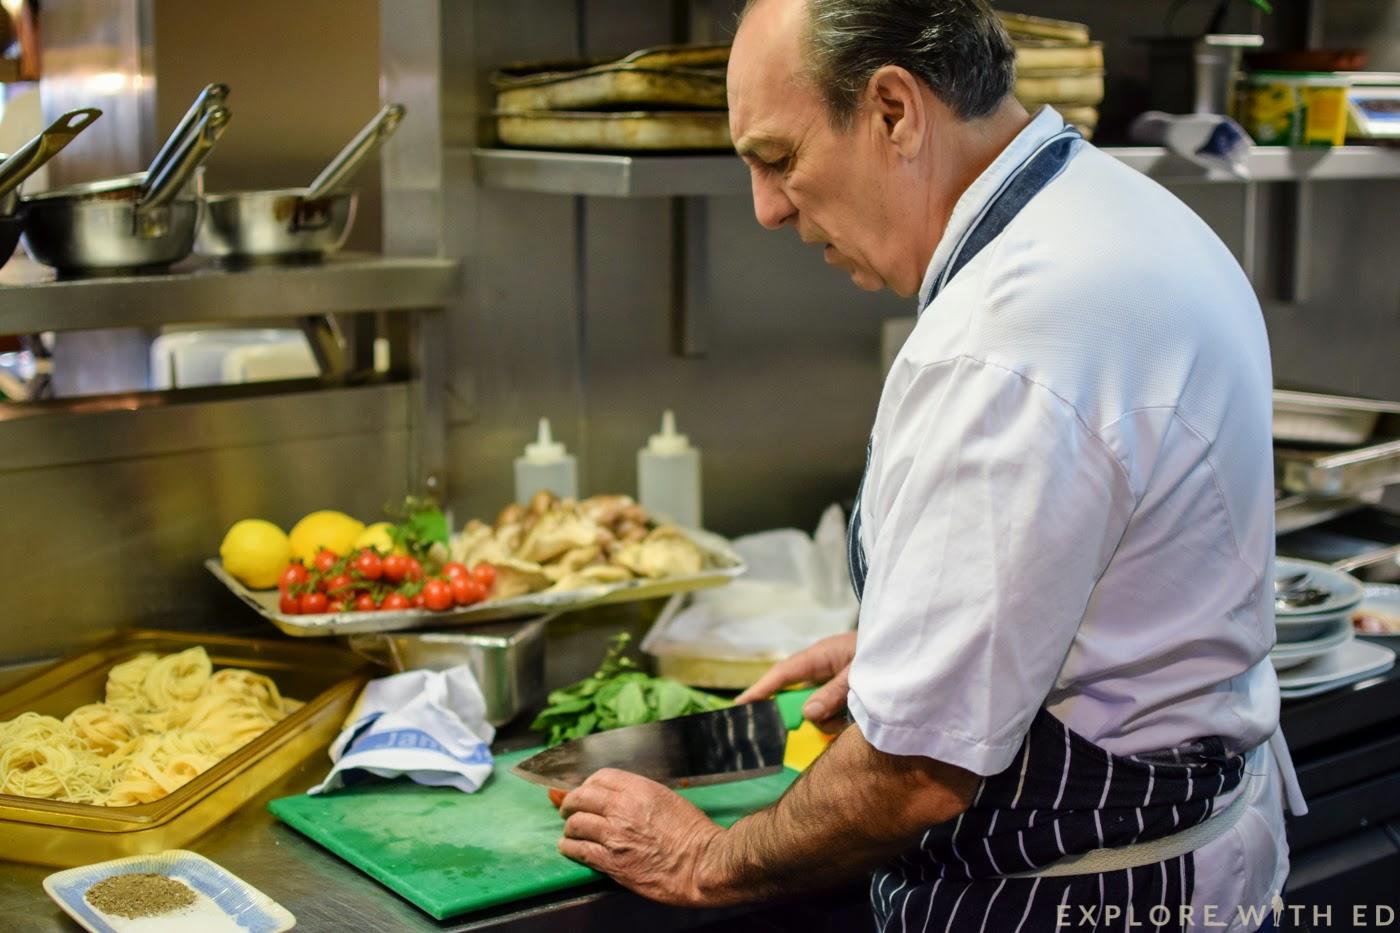 Gennaro cooking Jamie's Italian